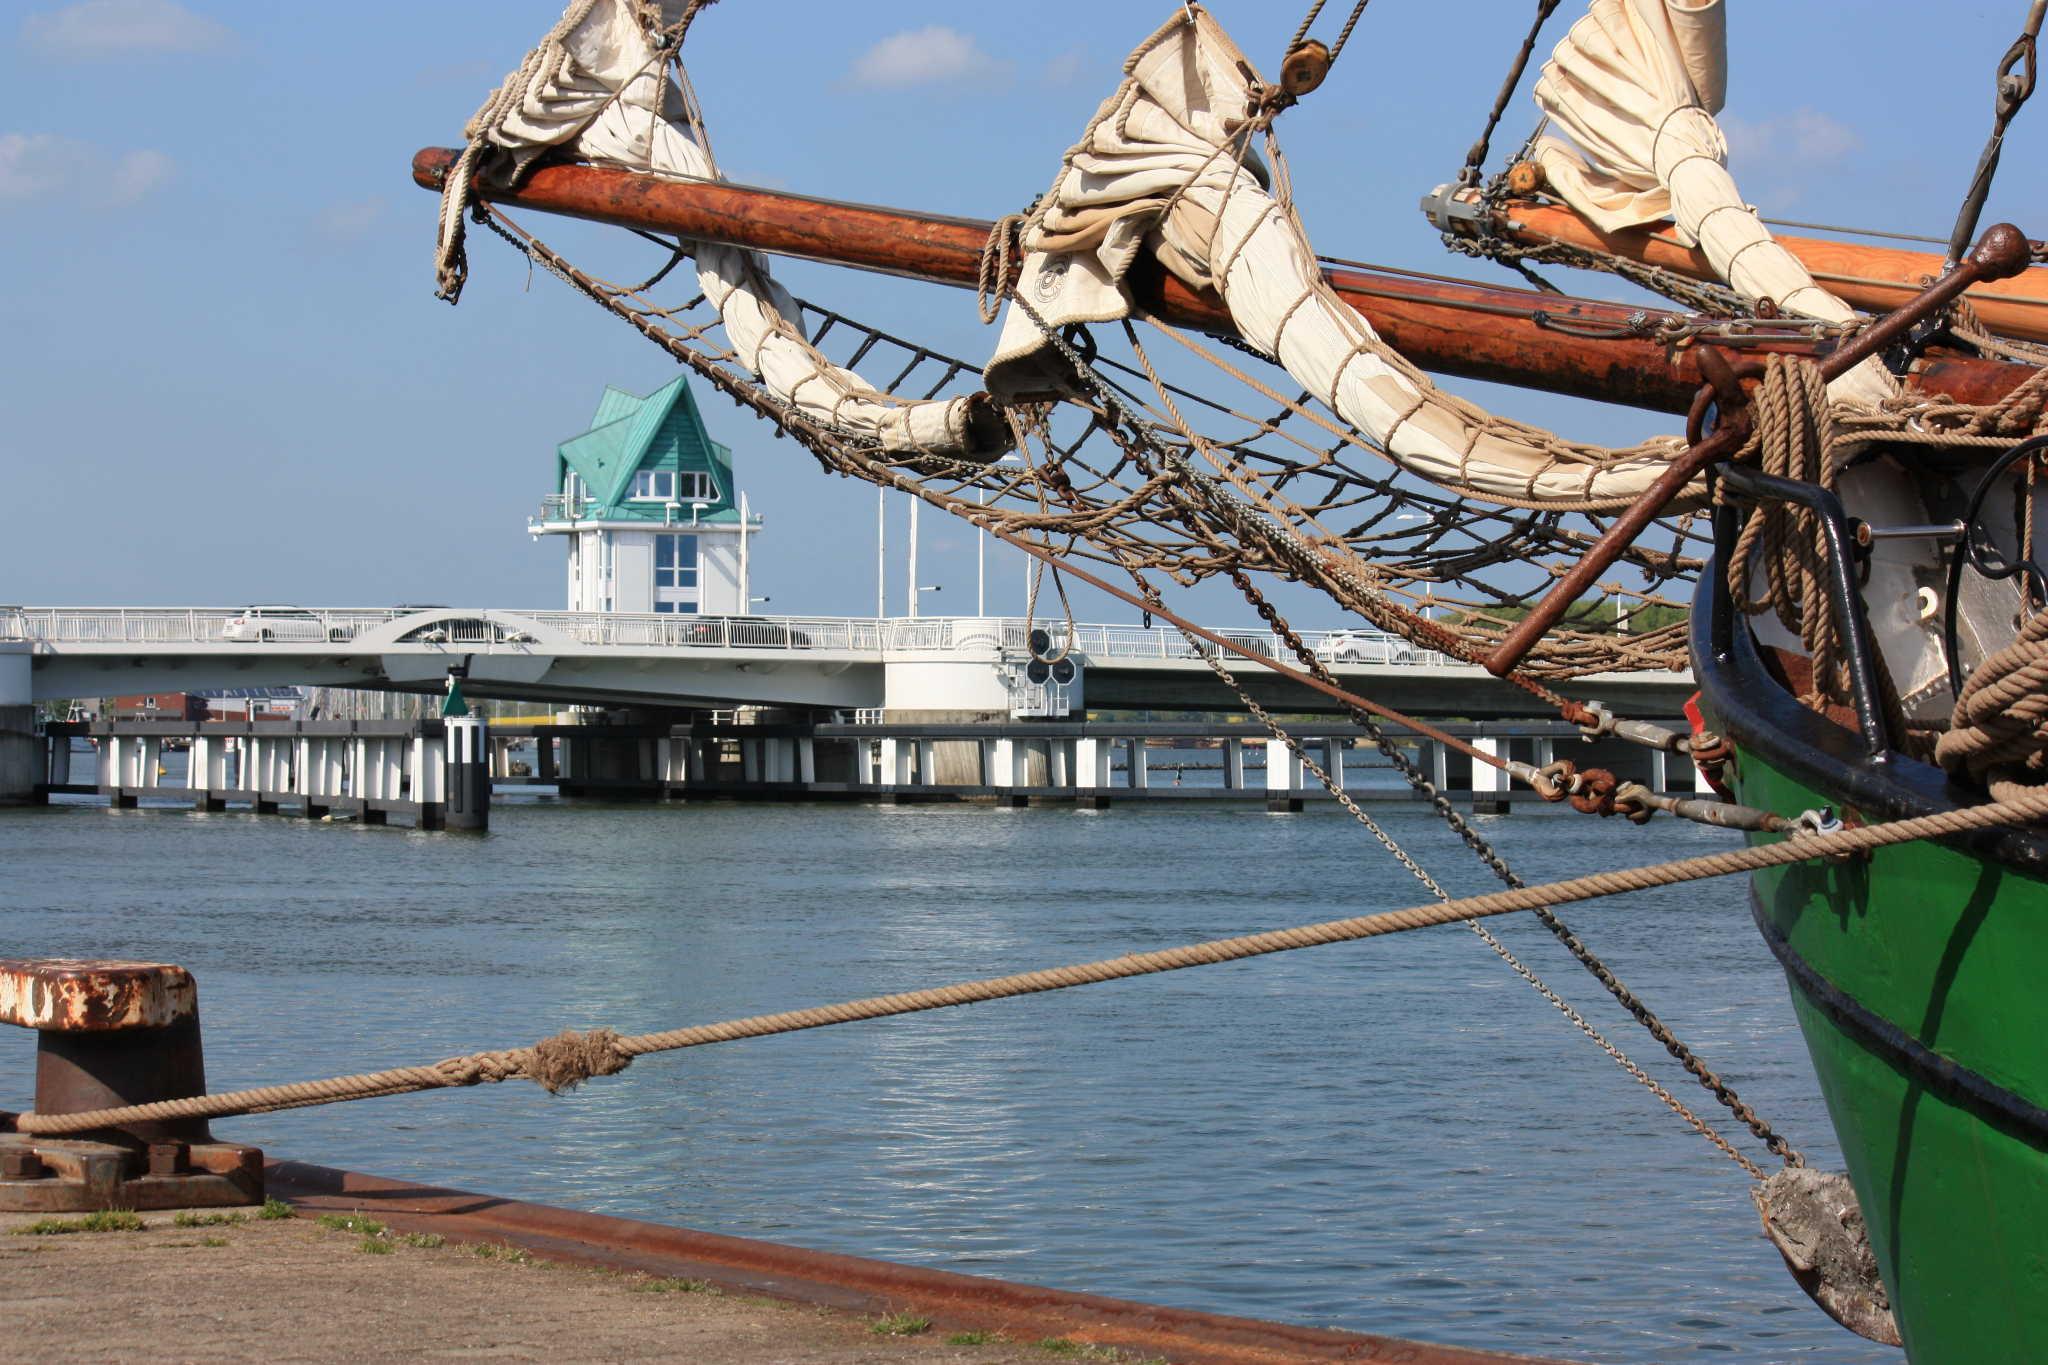 Hafenpromenade Kappeln